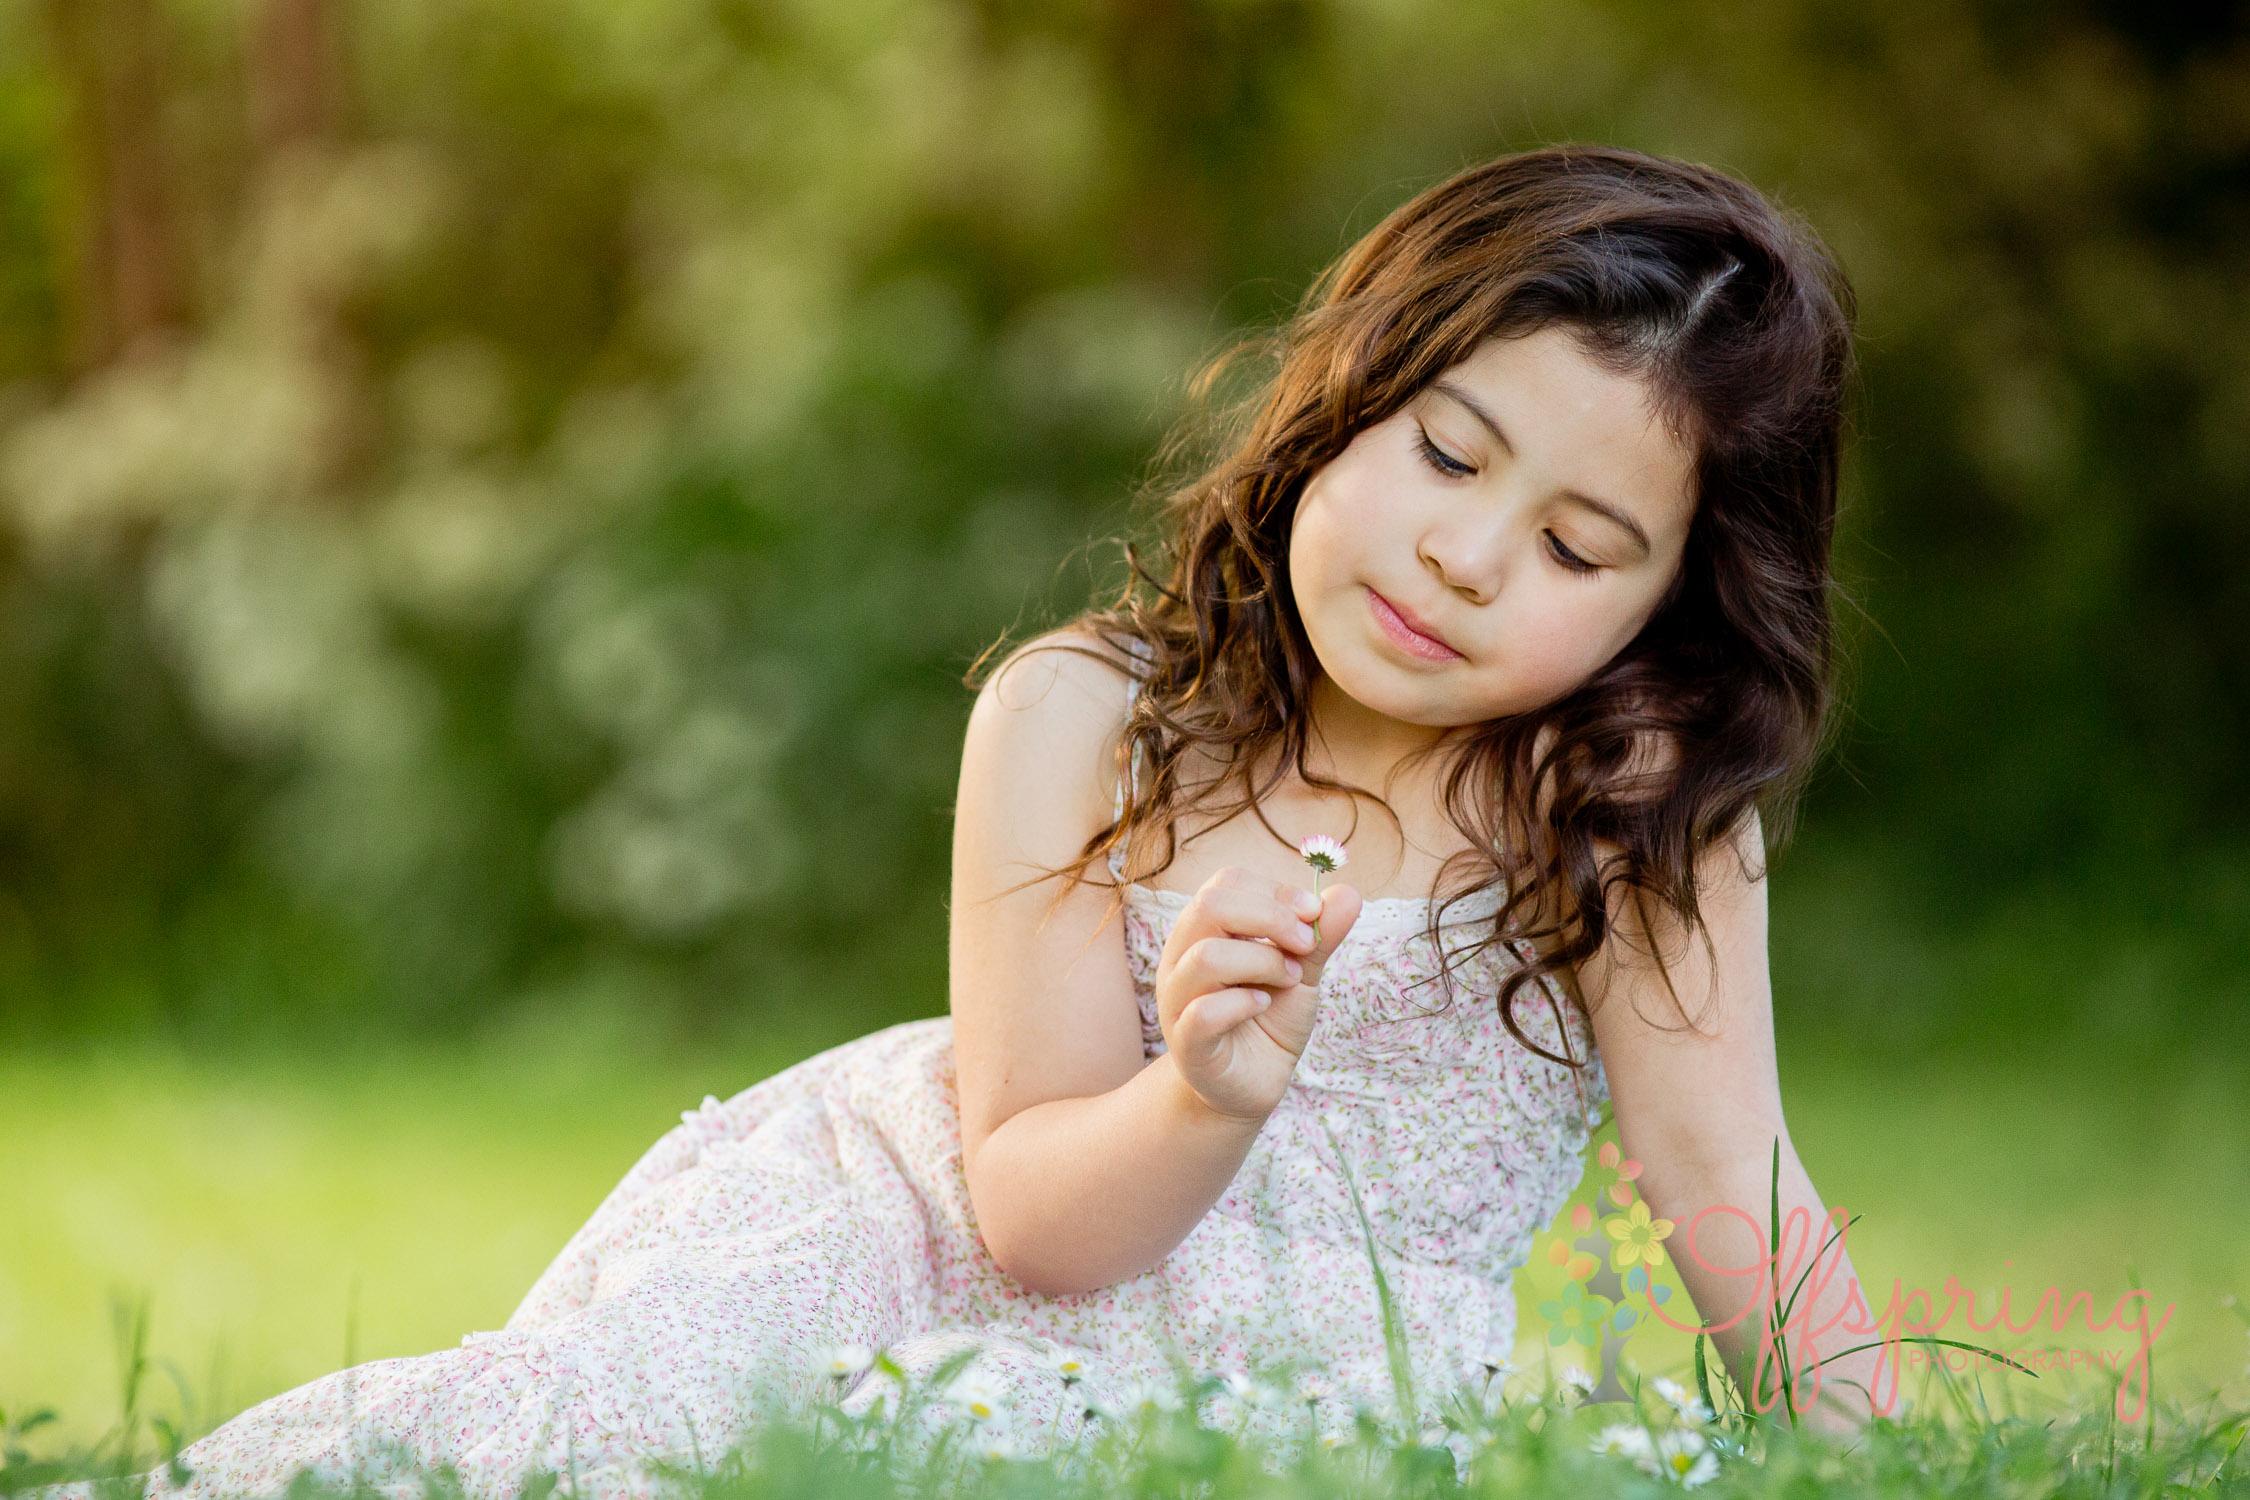 girl-picking-daisy-in-evening-sunlight